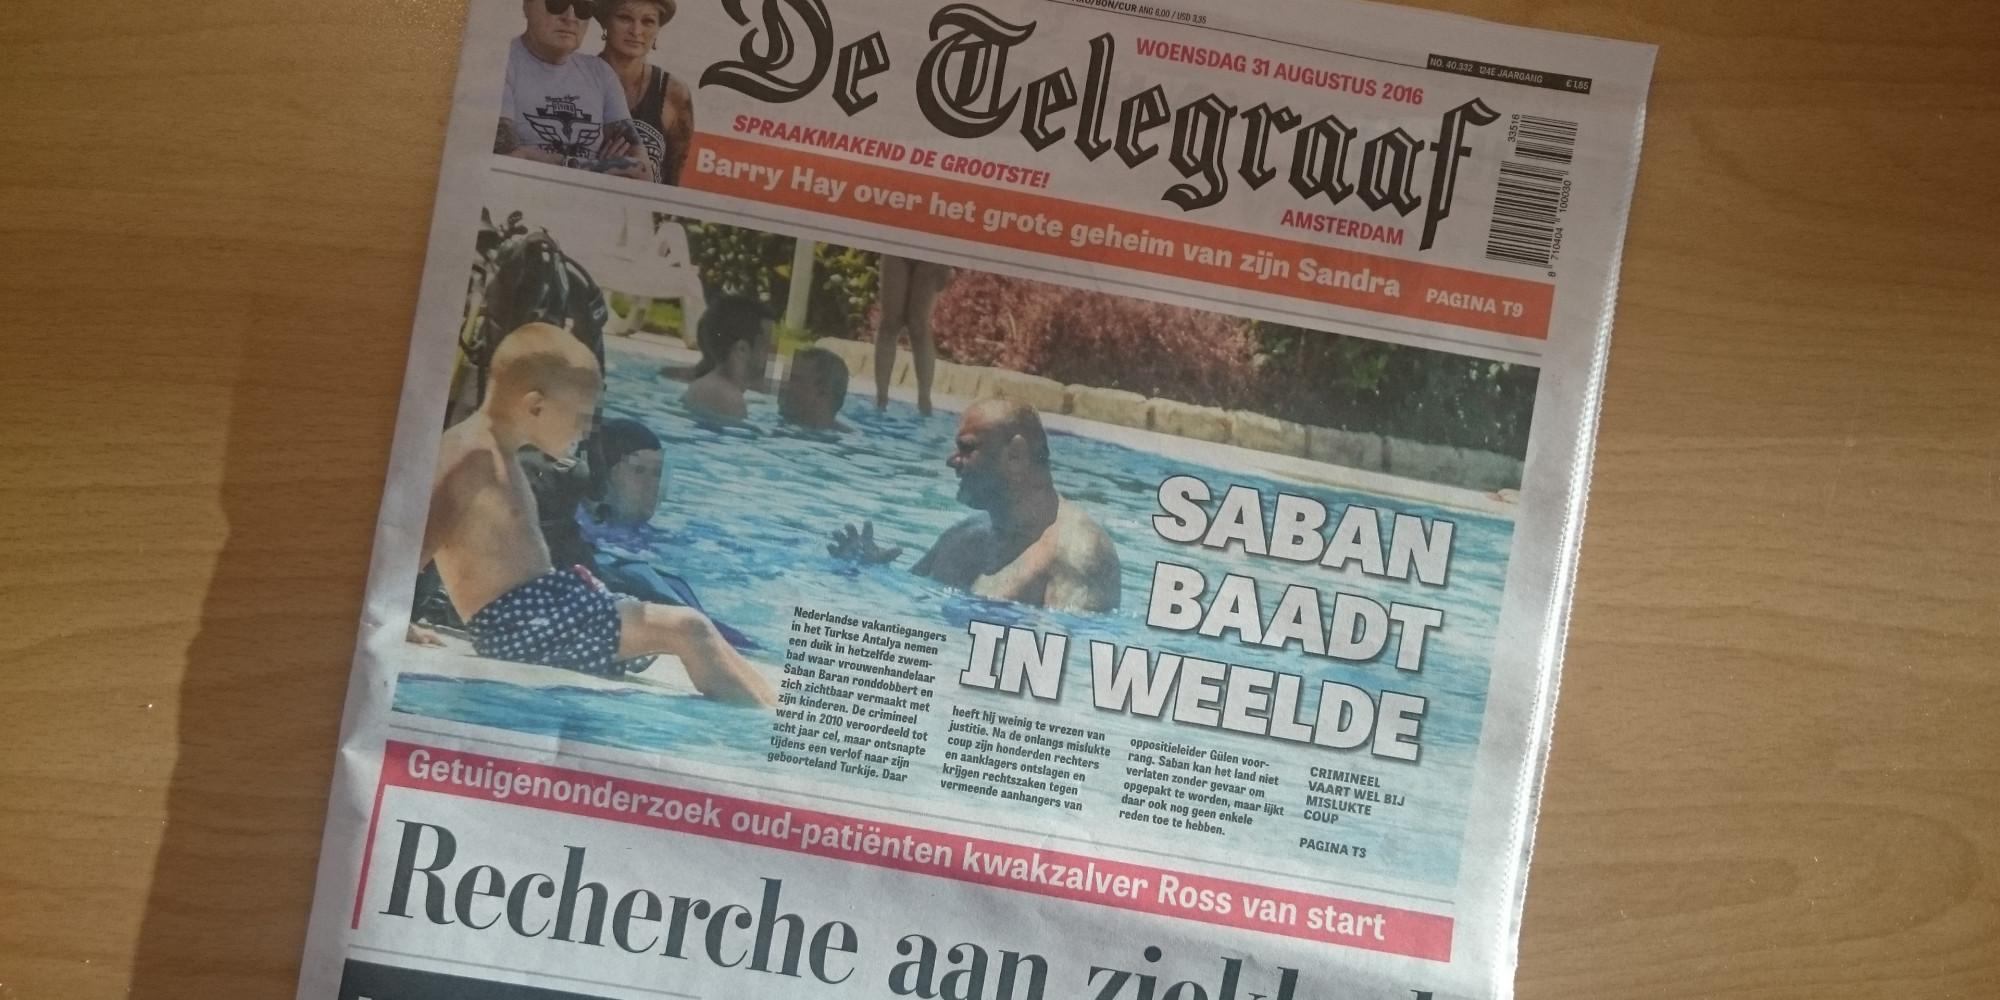 Saban B  zwemt rustig tussen de toeristen in Turkije - AT5